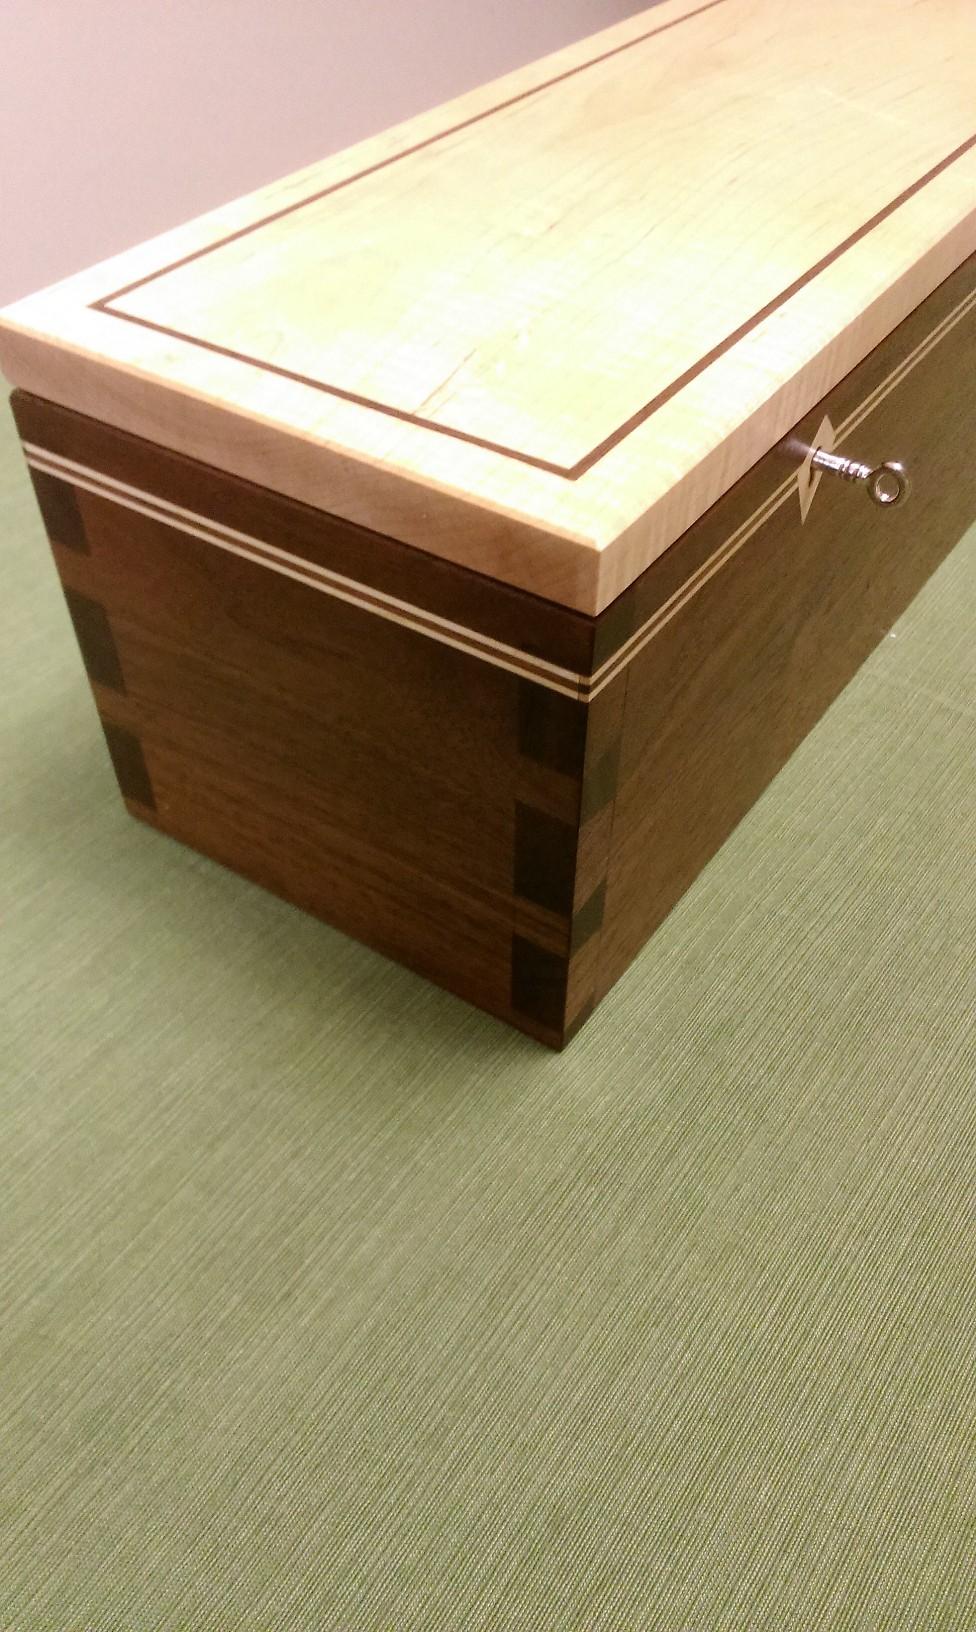 Unity Box - Walnut and Maple